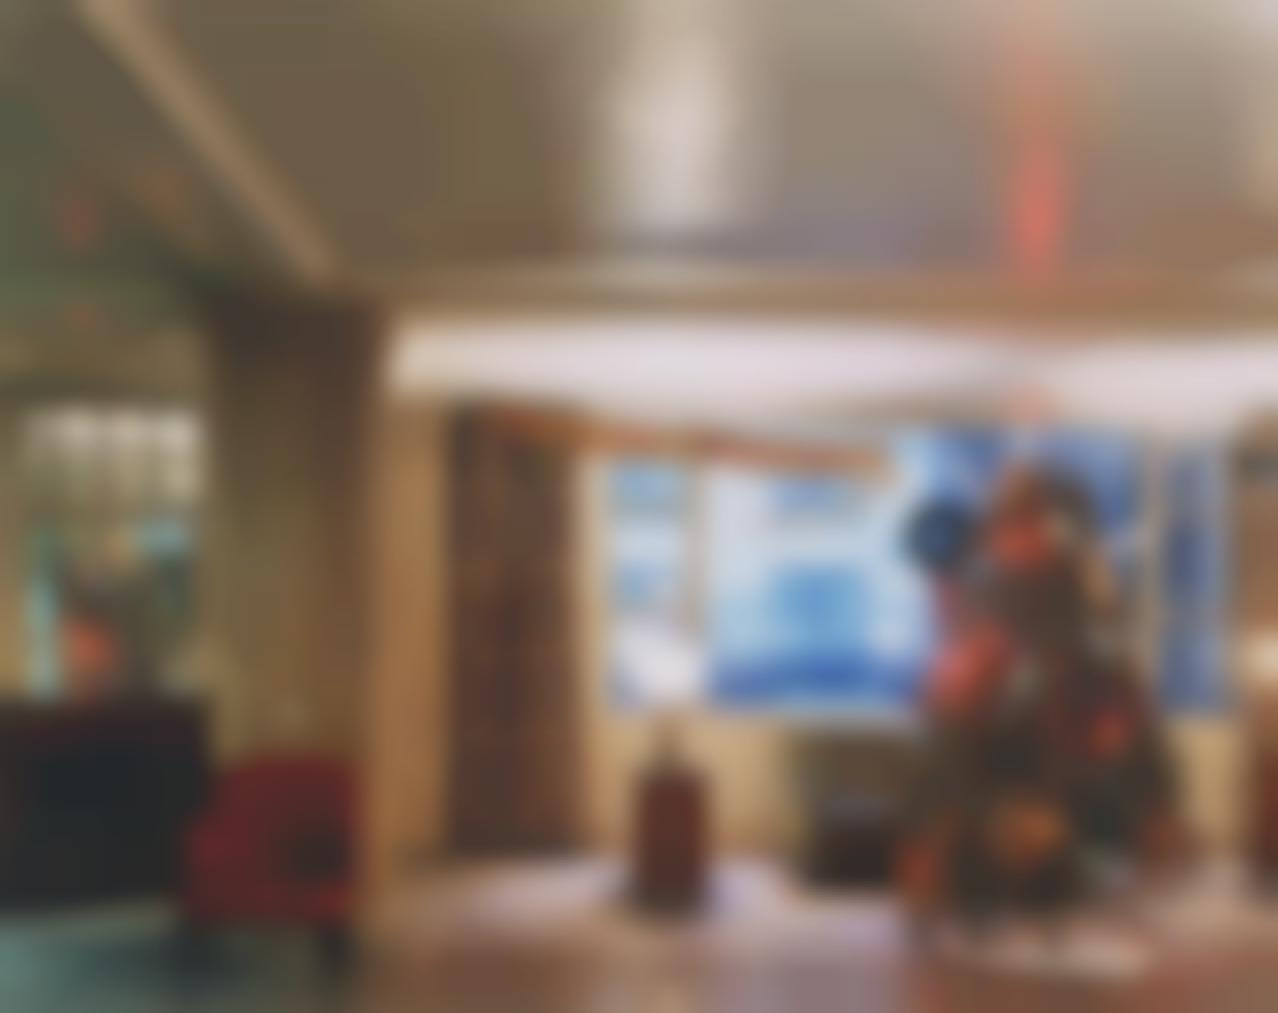 Joel Meyerowitz-Christmas Tree In Lobby, New York City-1977